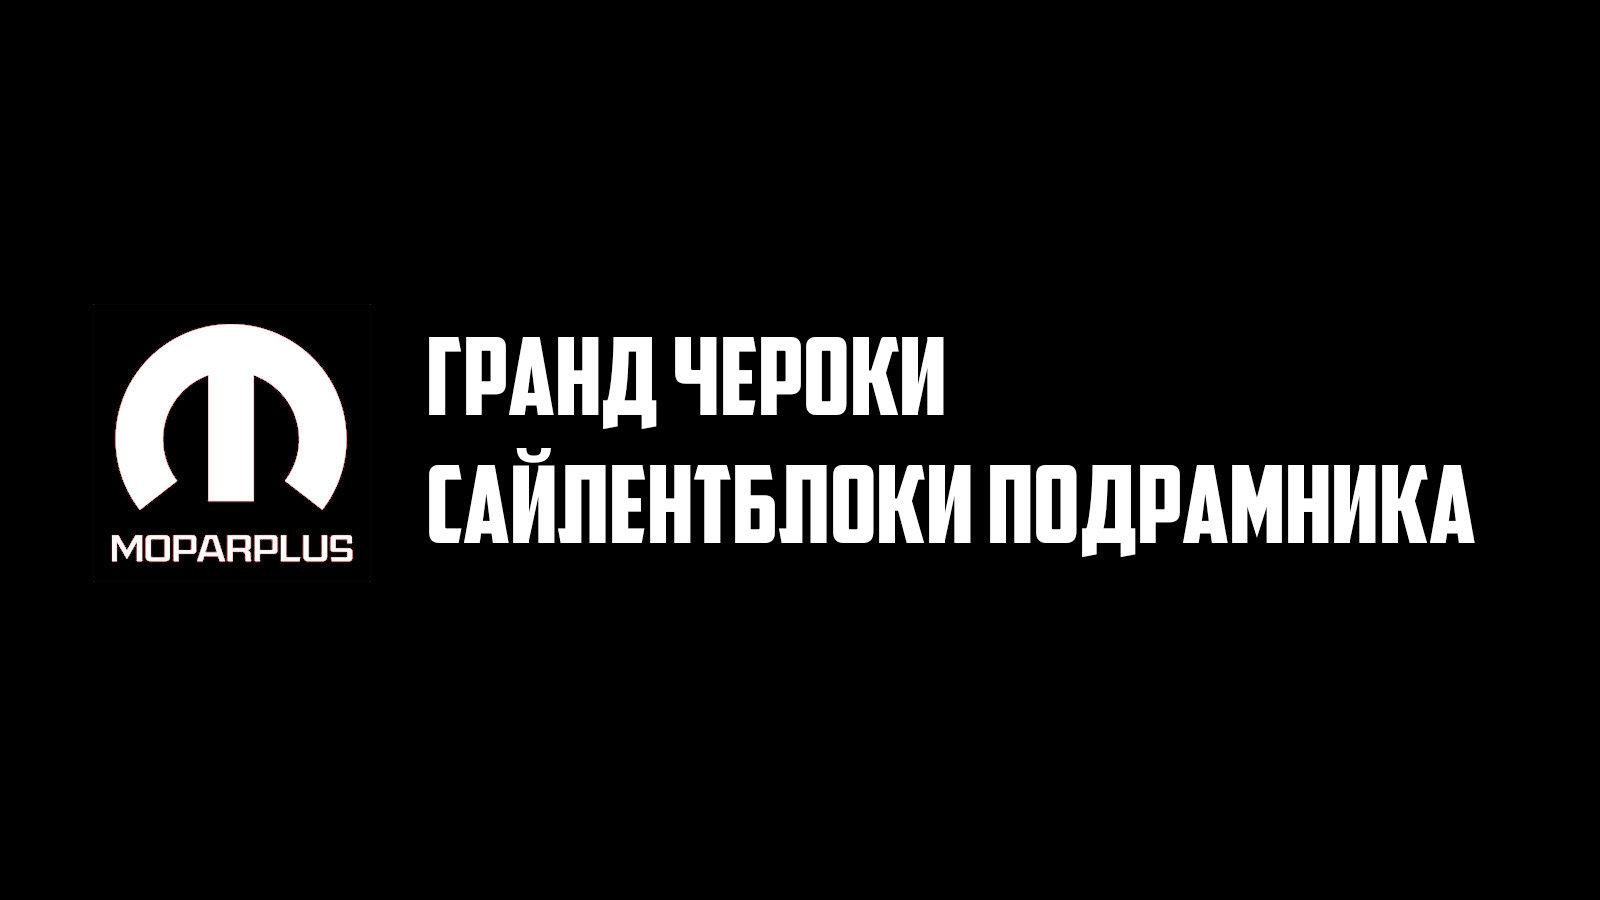 Сайлентблоки подрамника Гранд Чероки WK2